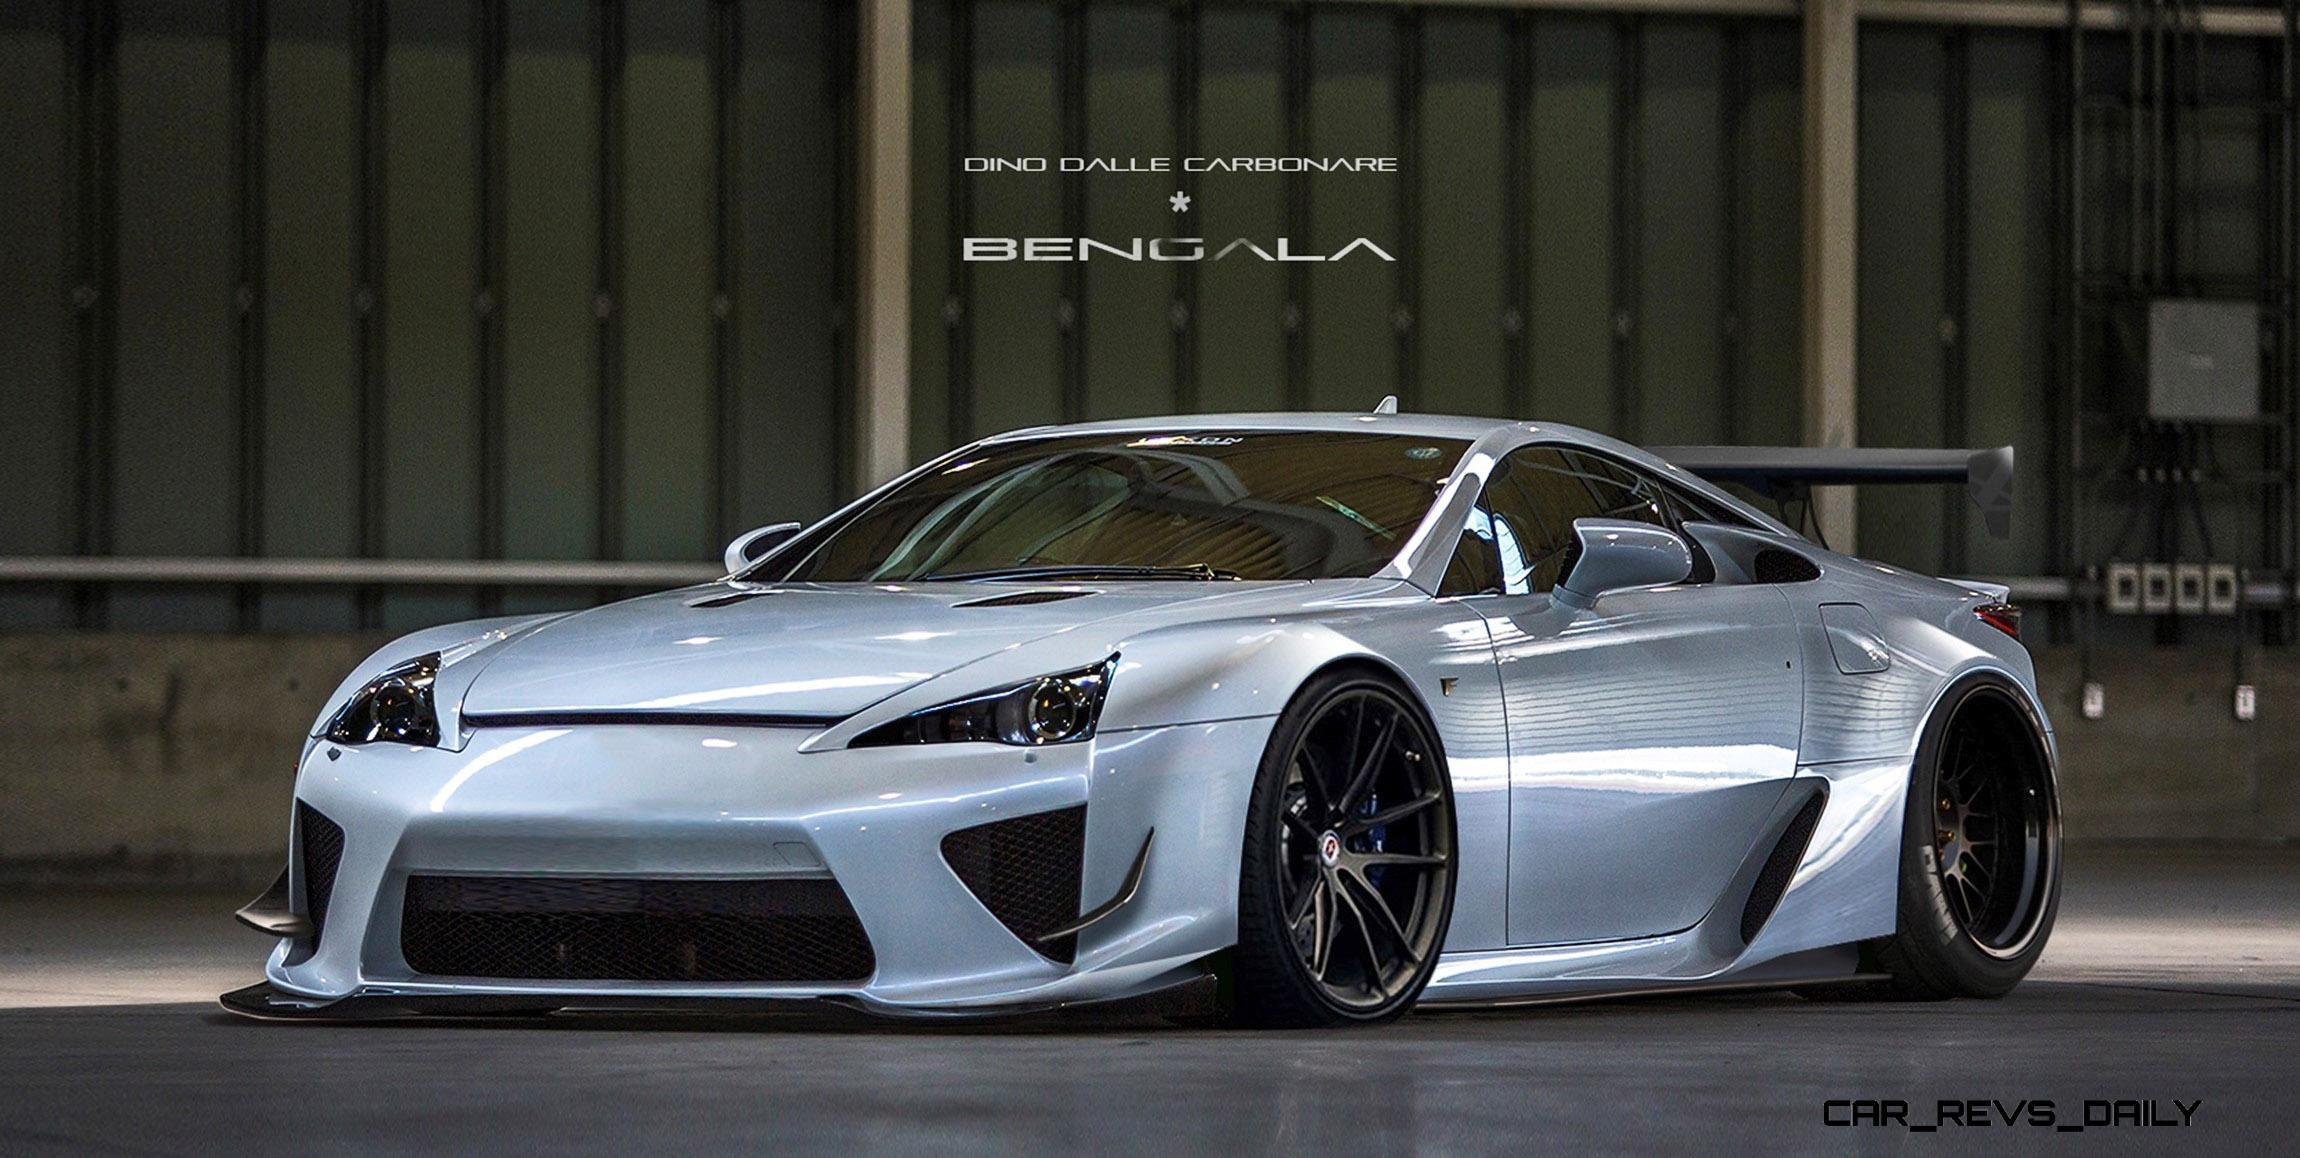 Latest Lexus Cars >> BENGALA Auto Design - Widebody Boutique Prelaunch Gallery